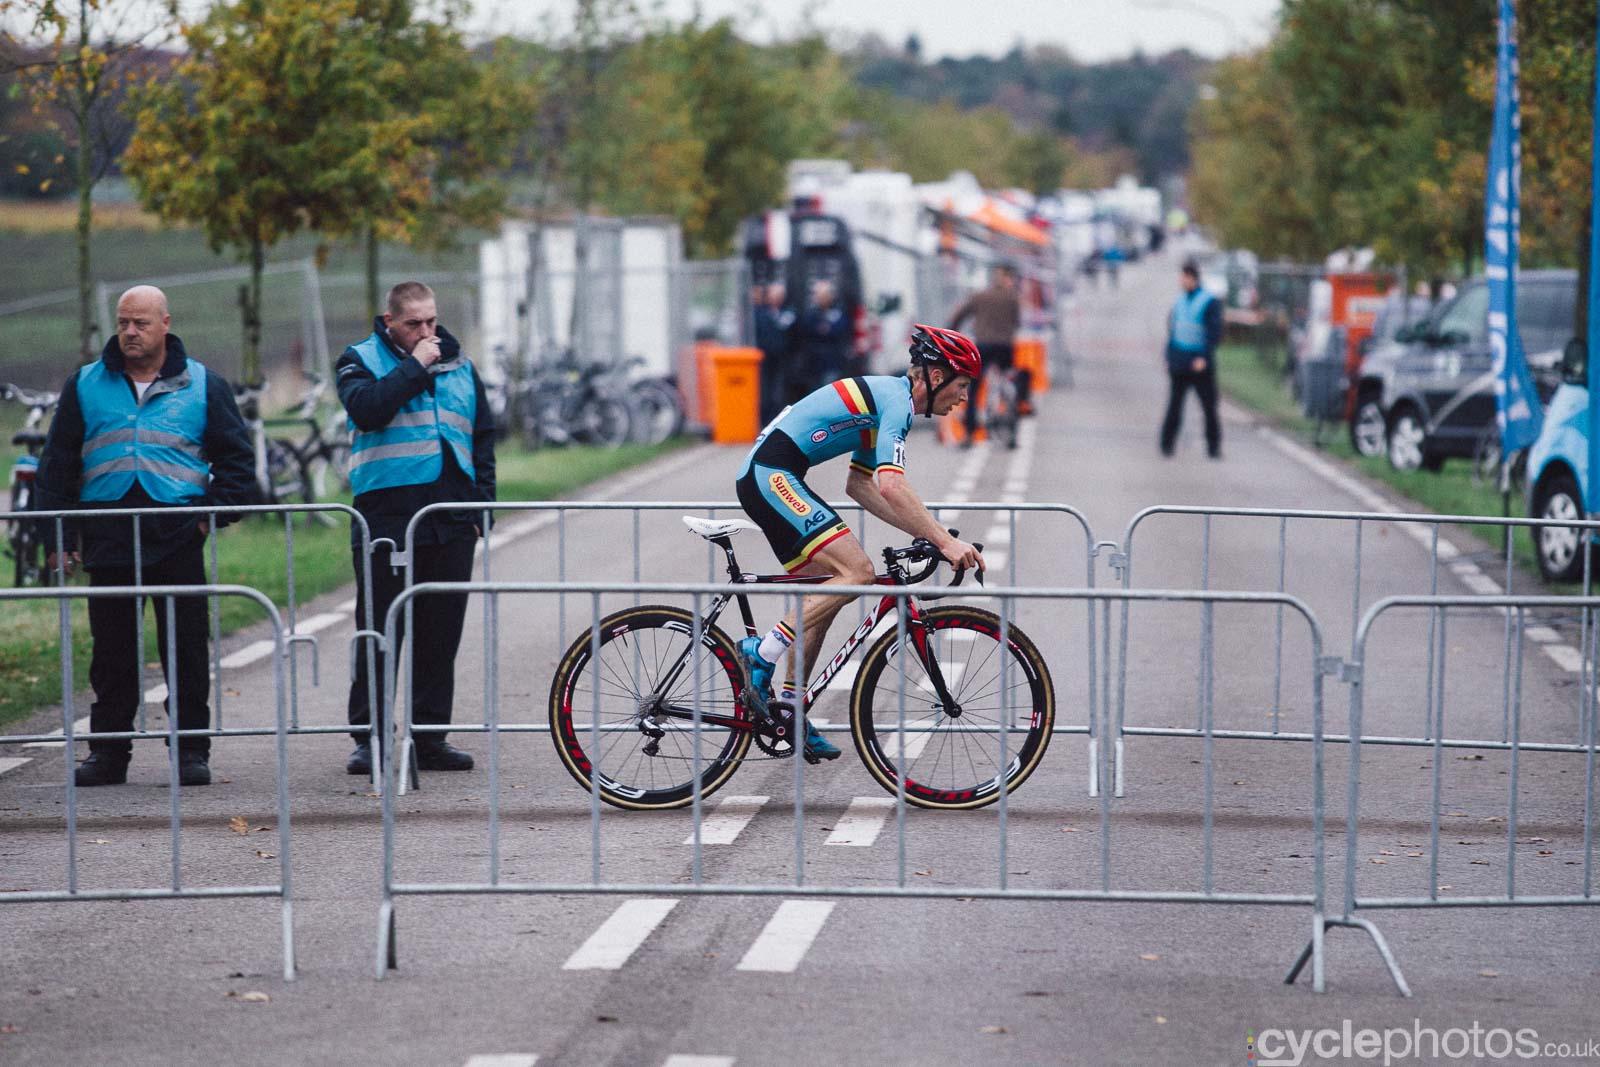 2015-cyclephotos-cyclocross-eucx-huijbergen-153245-kevin-pauwels